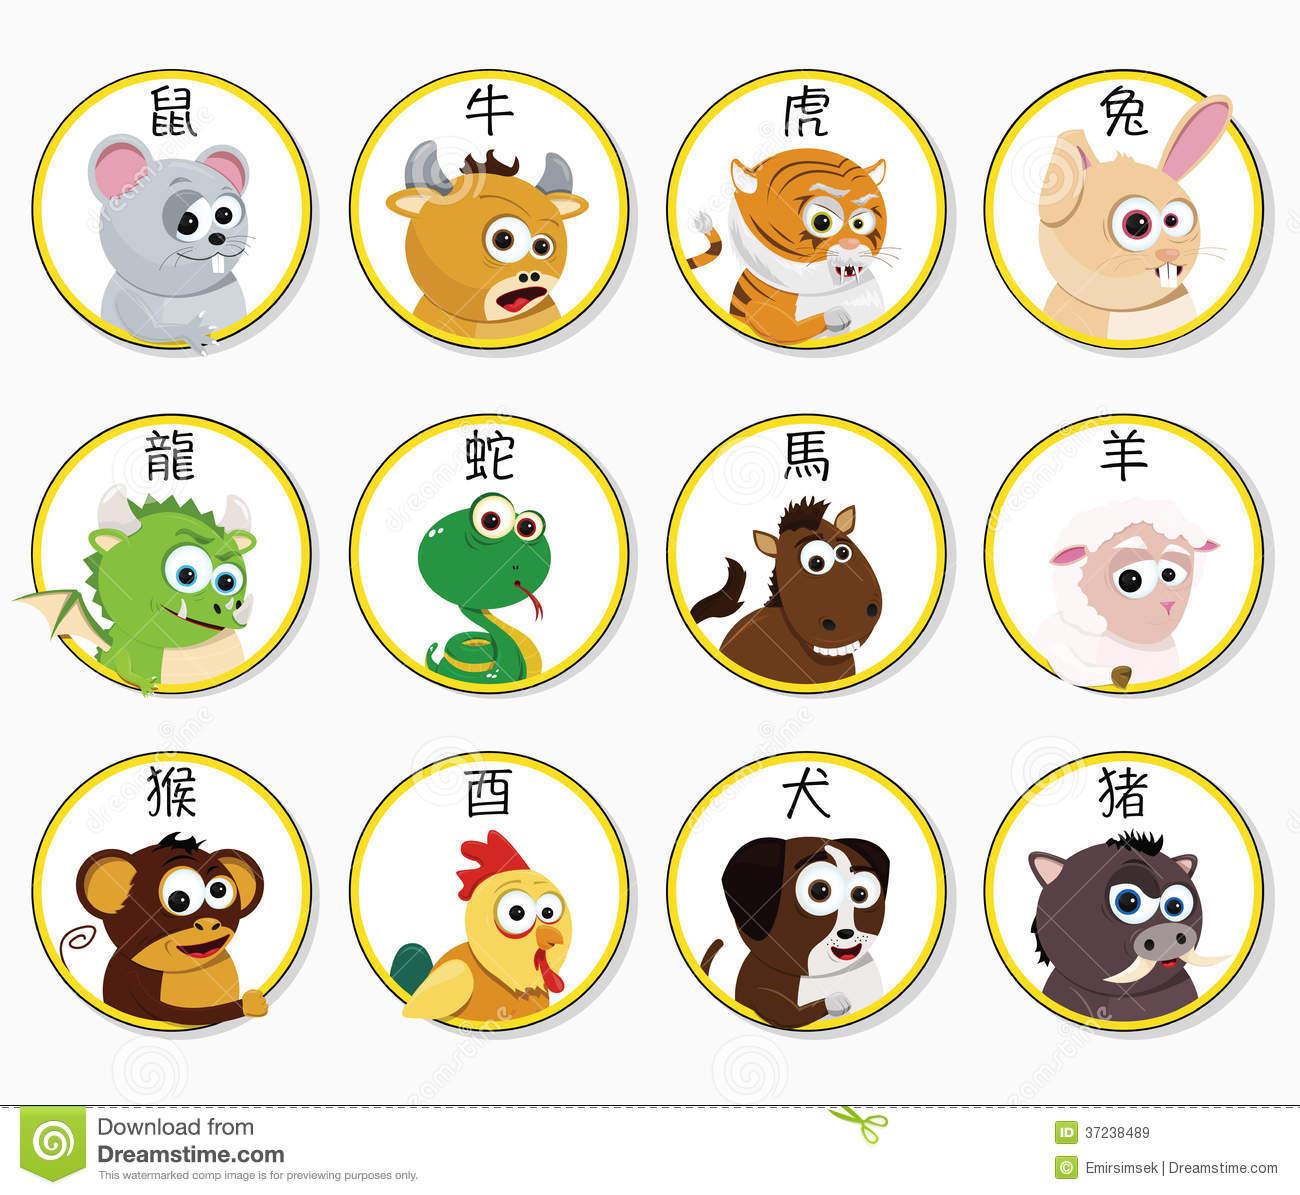 12 Shio Dalam Bahasa Mandarin 12 Chinese Zodiac Sign